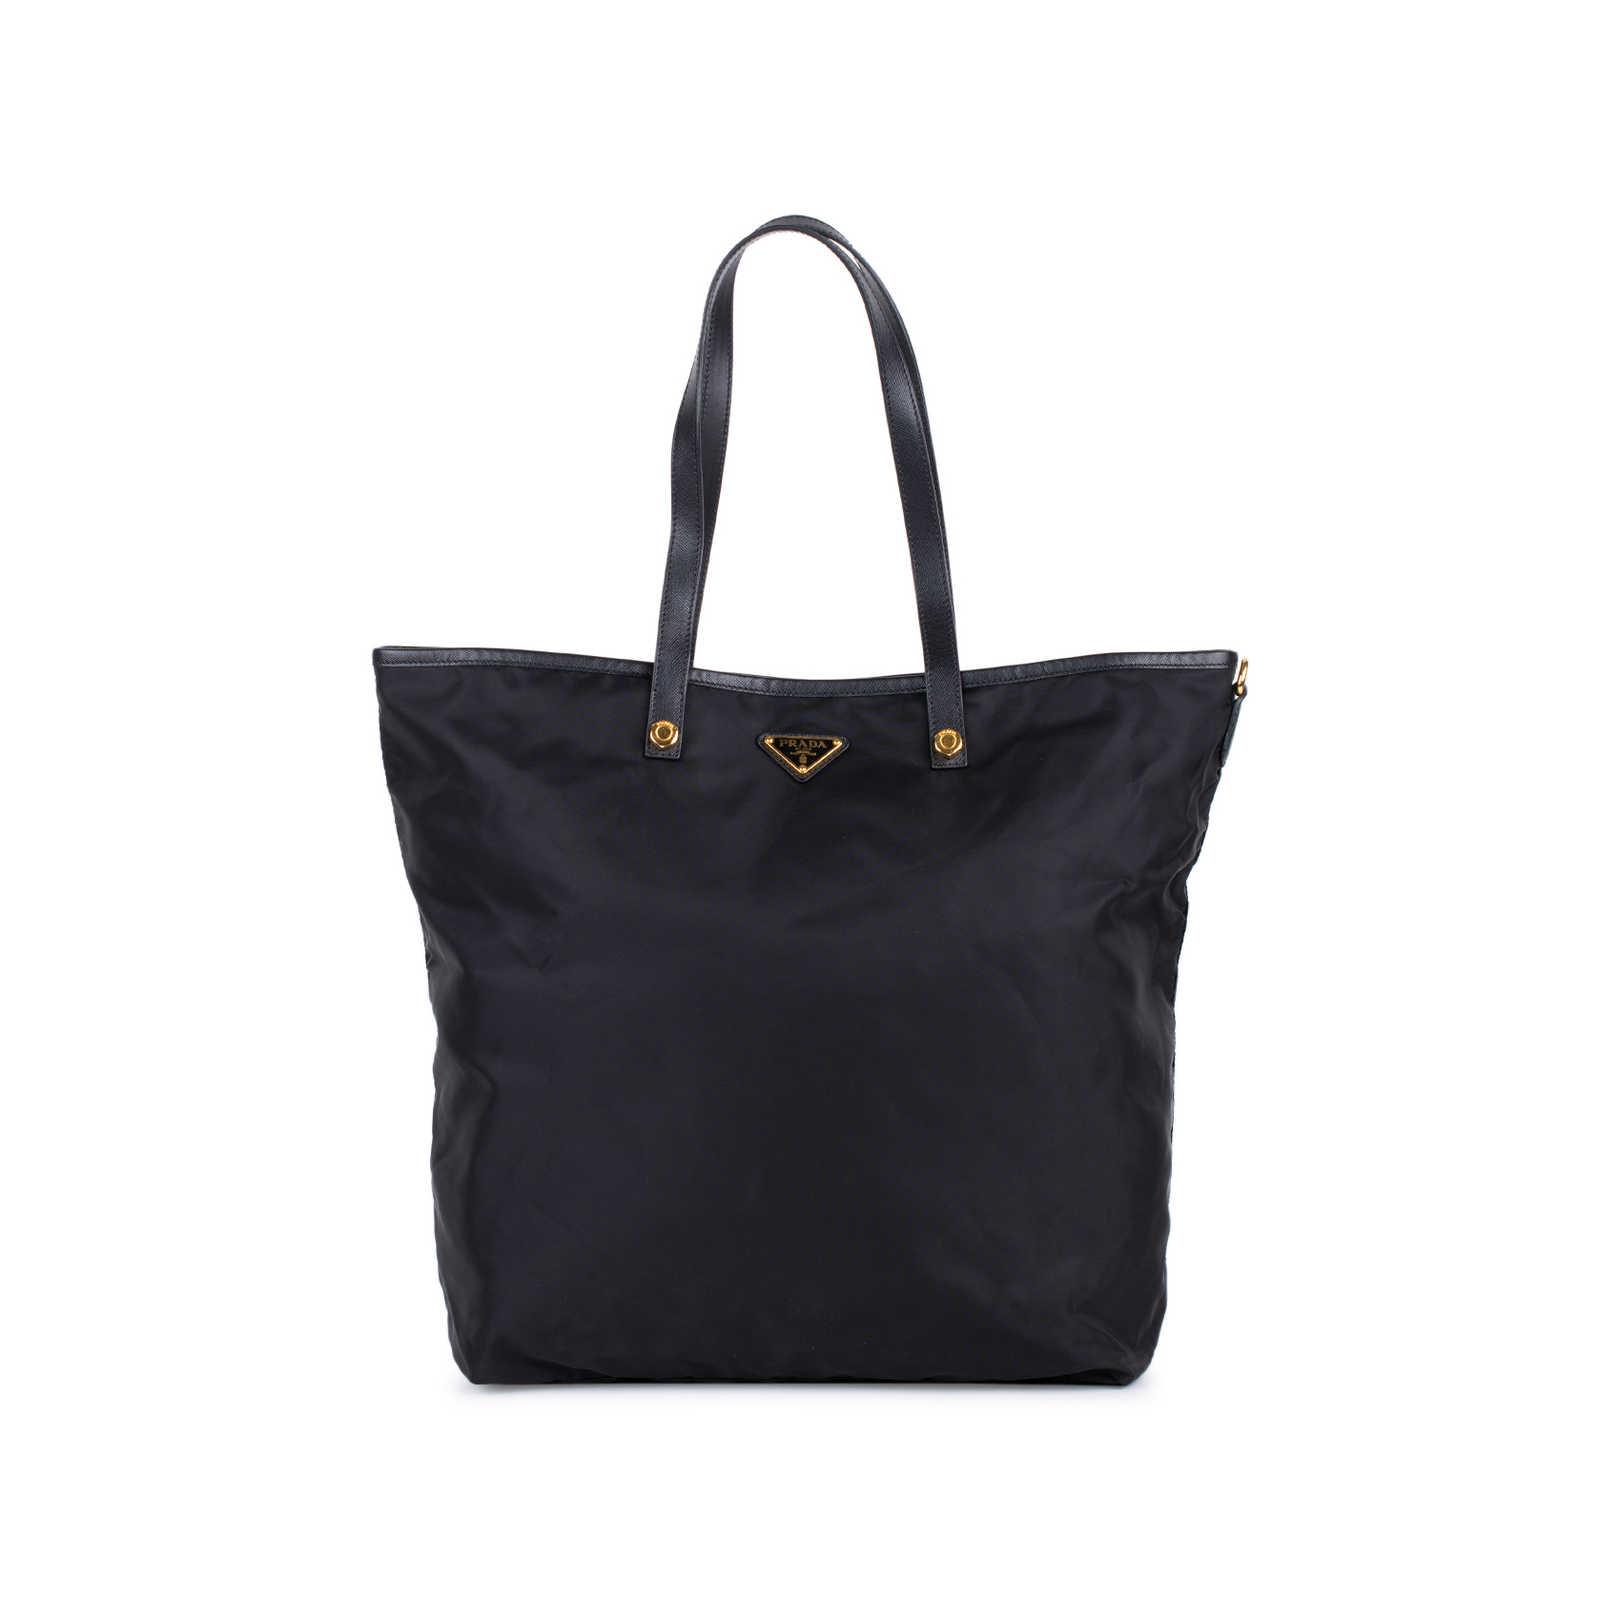 4f833c588dad ... Authentic Second Hand Prada Nylon Tote Bag (PSS-333-00029) - Thumbnail  ...